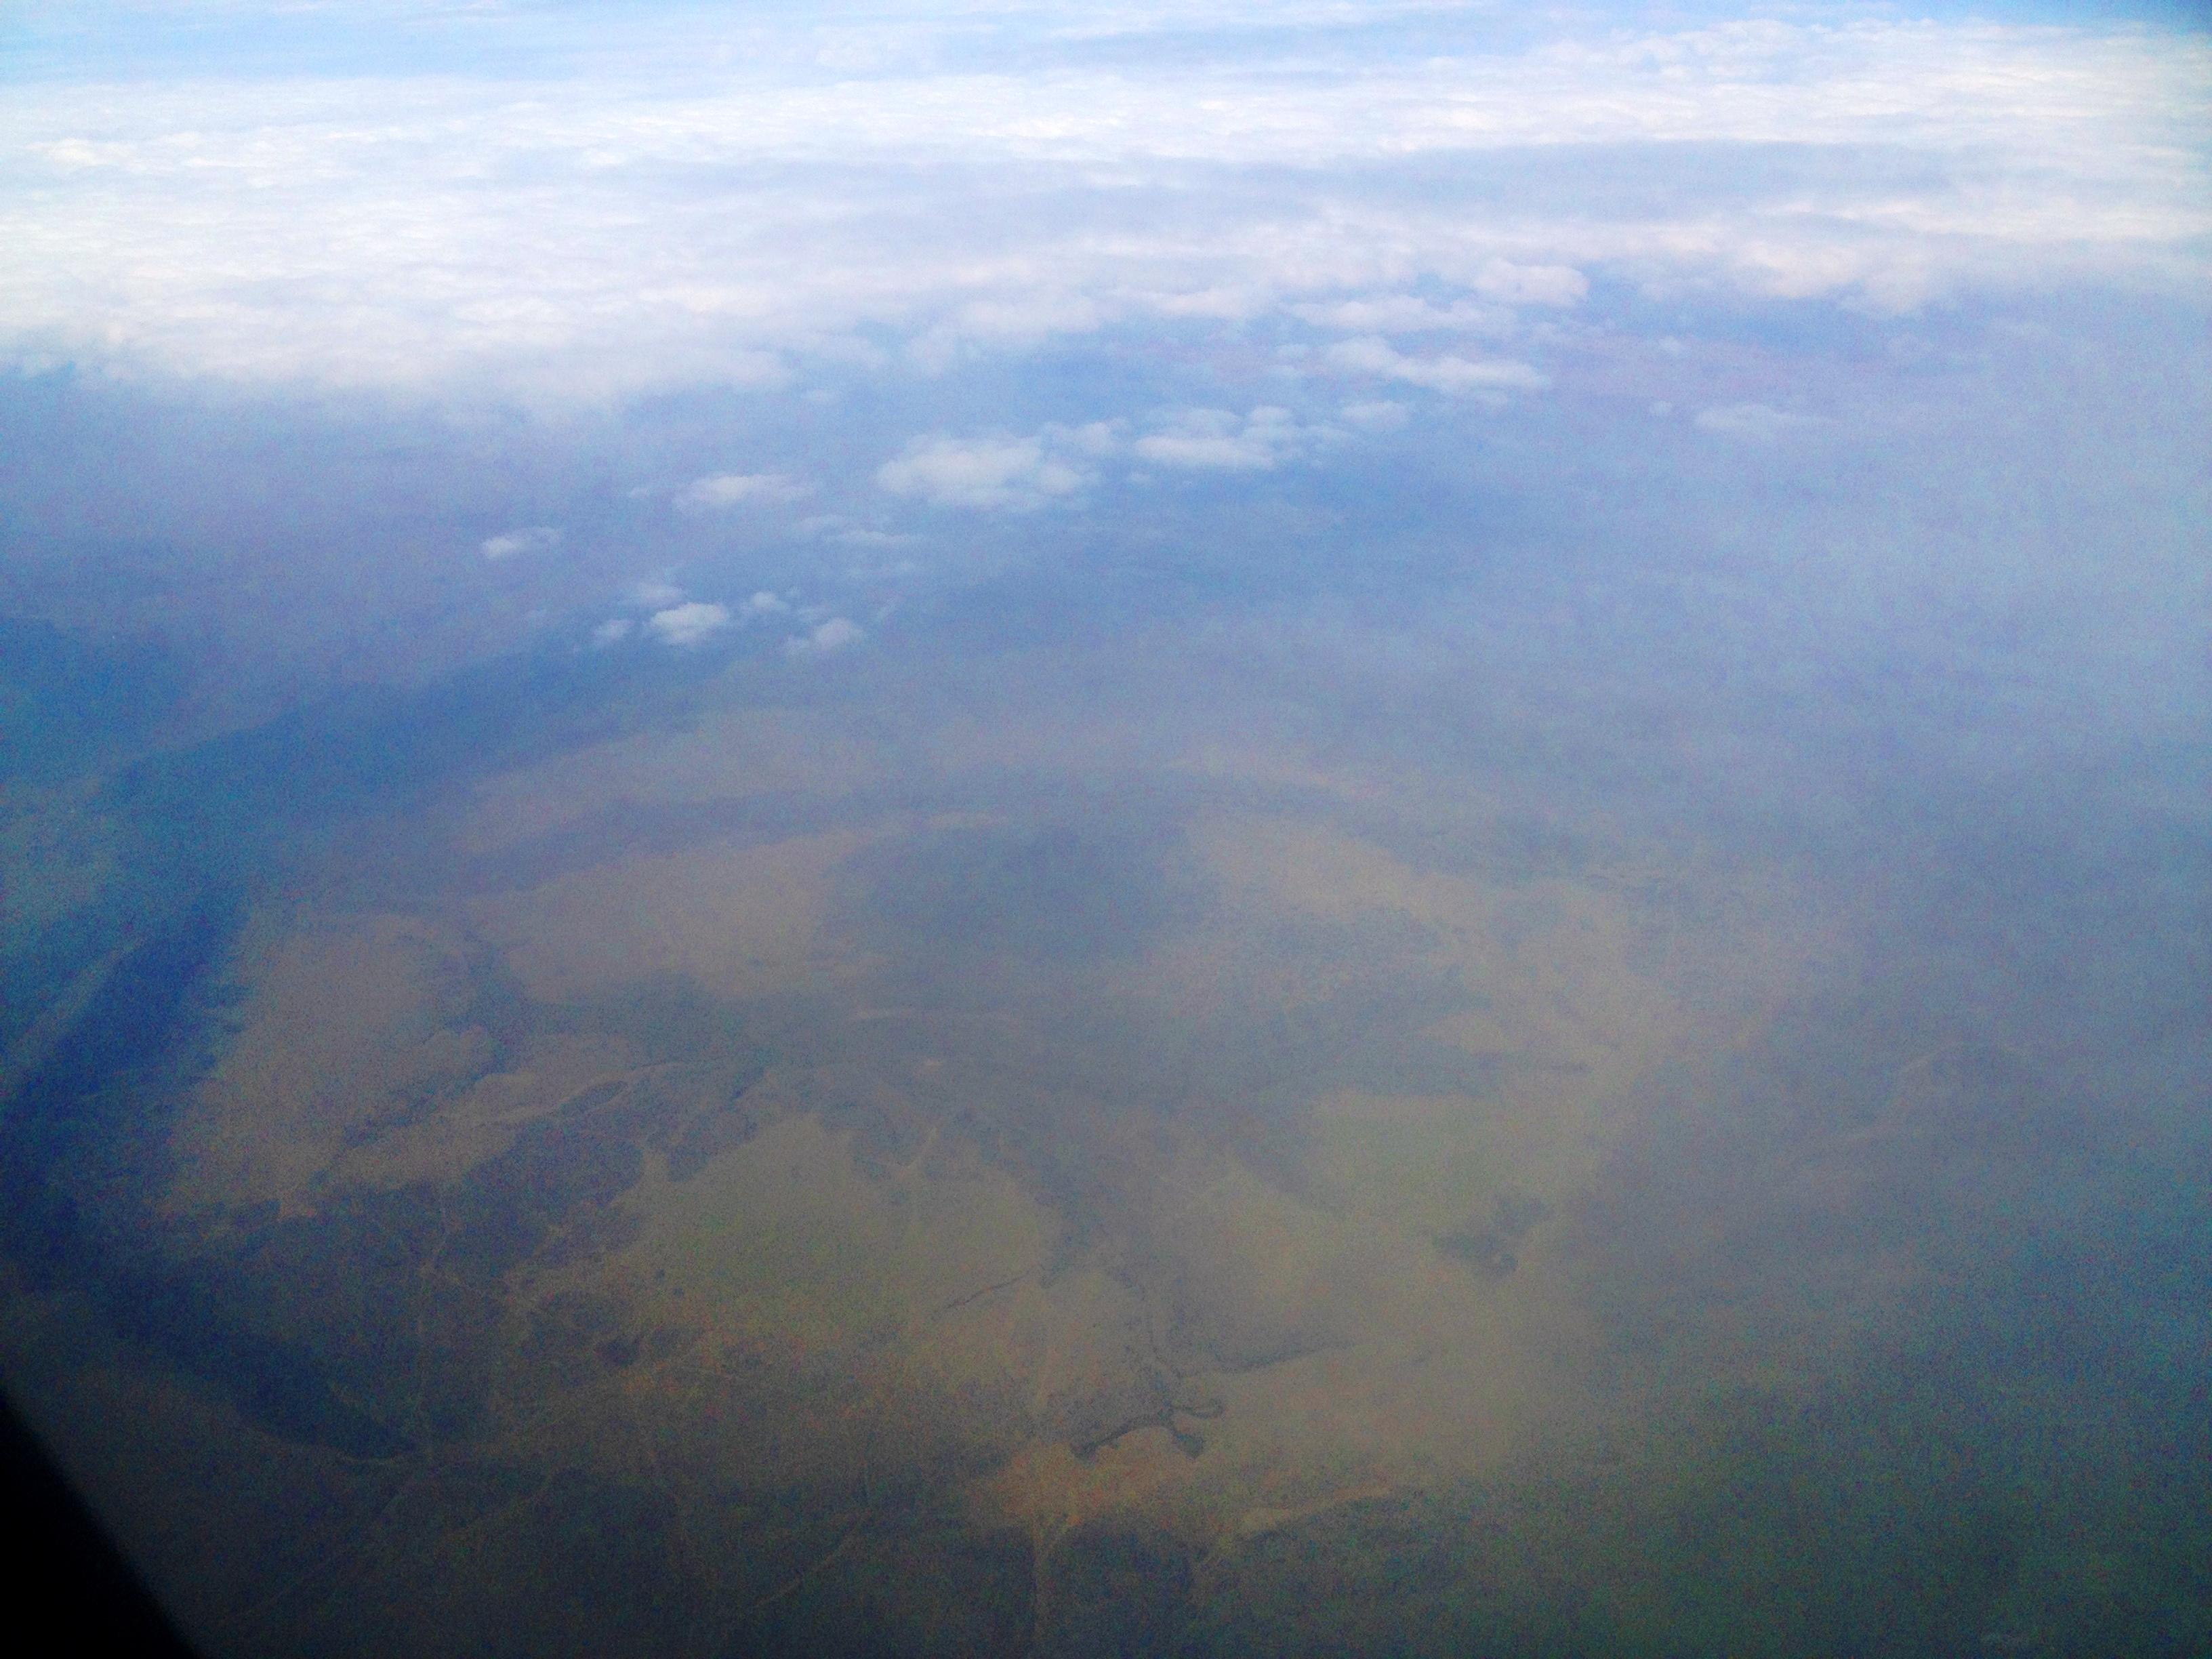 Flying over the Ngorogoro Crater